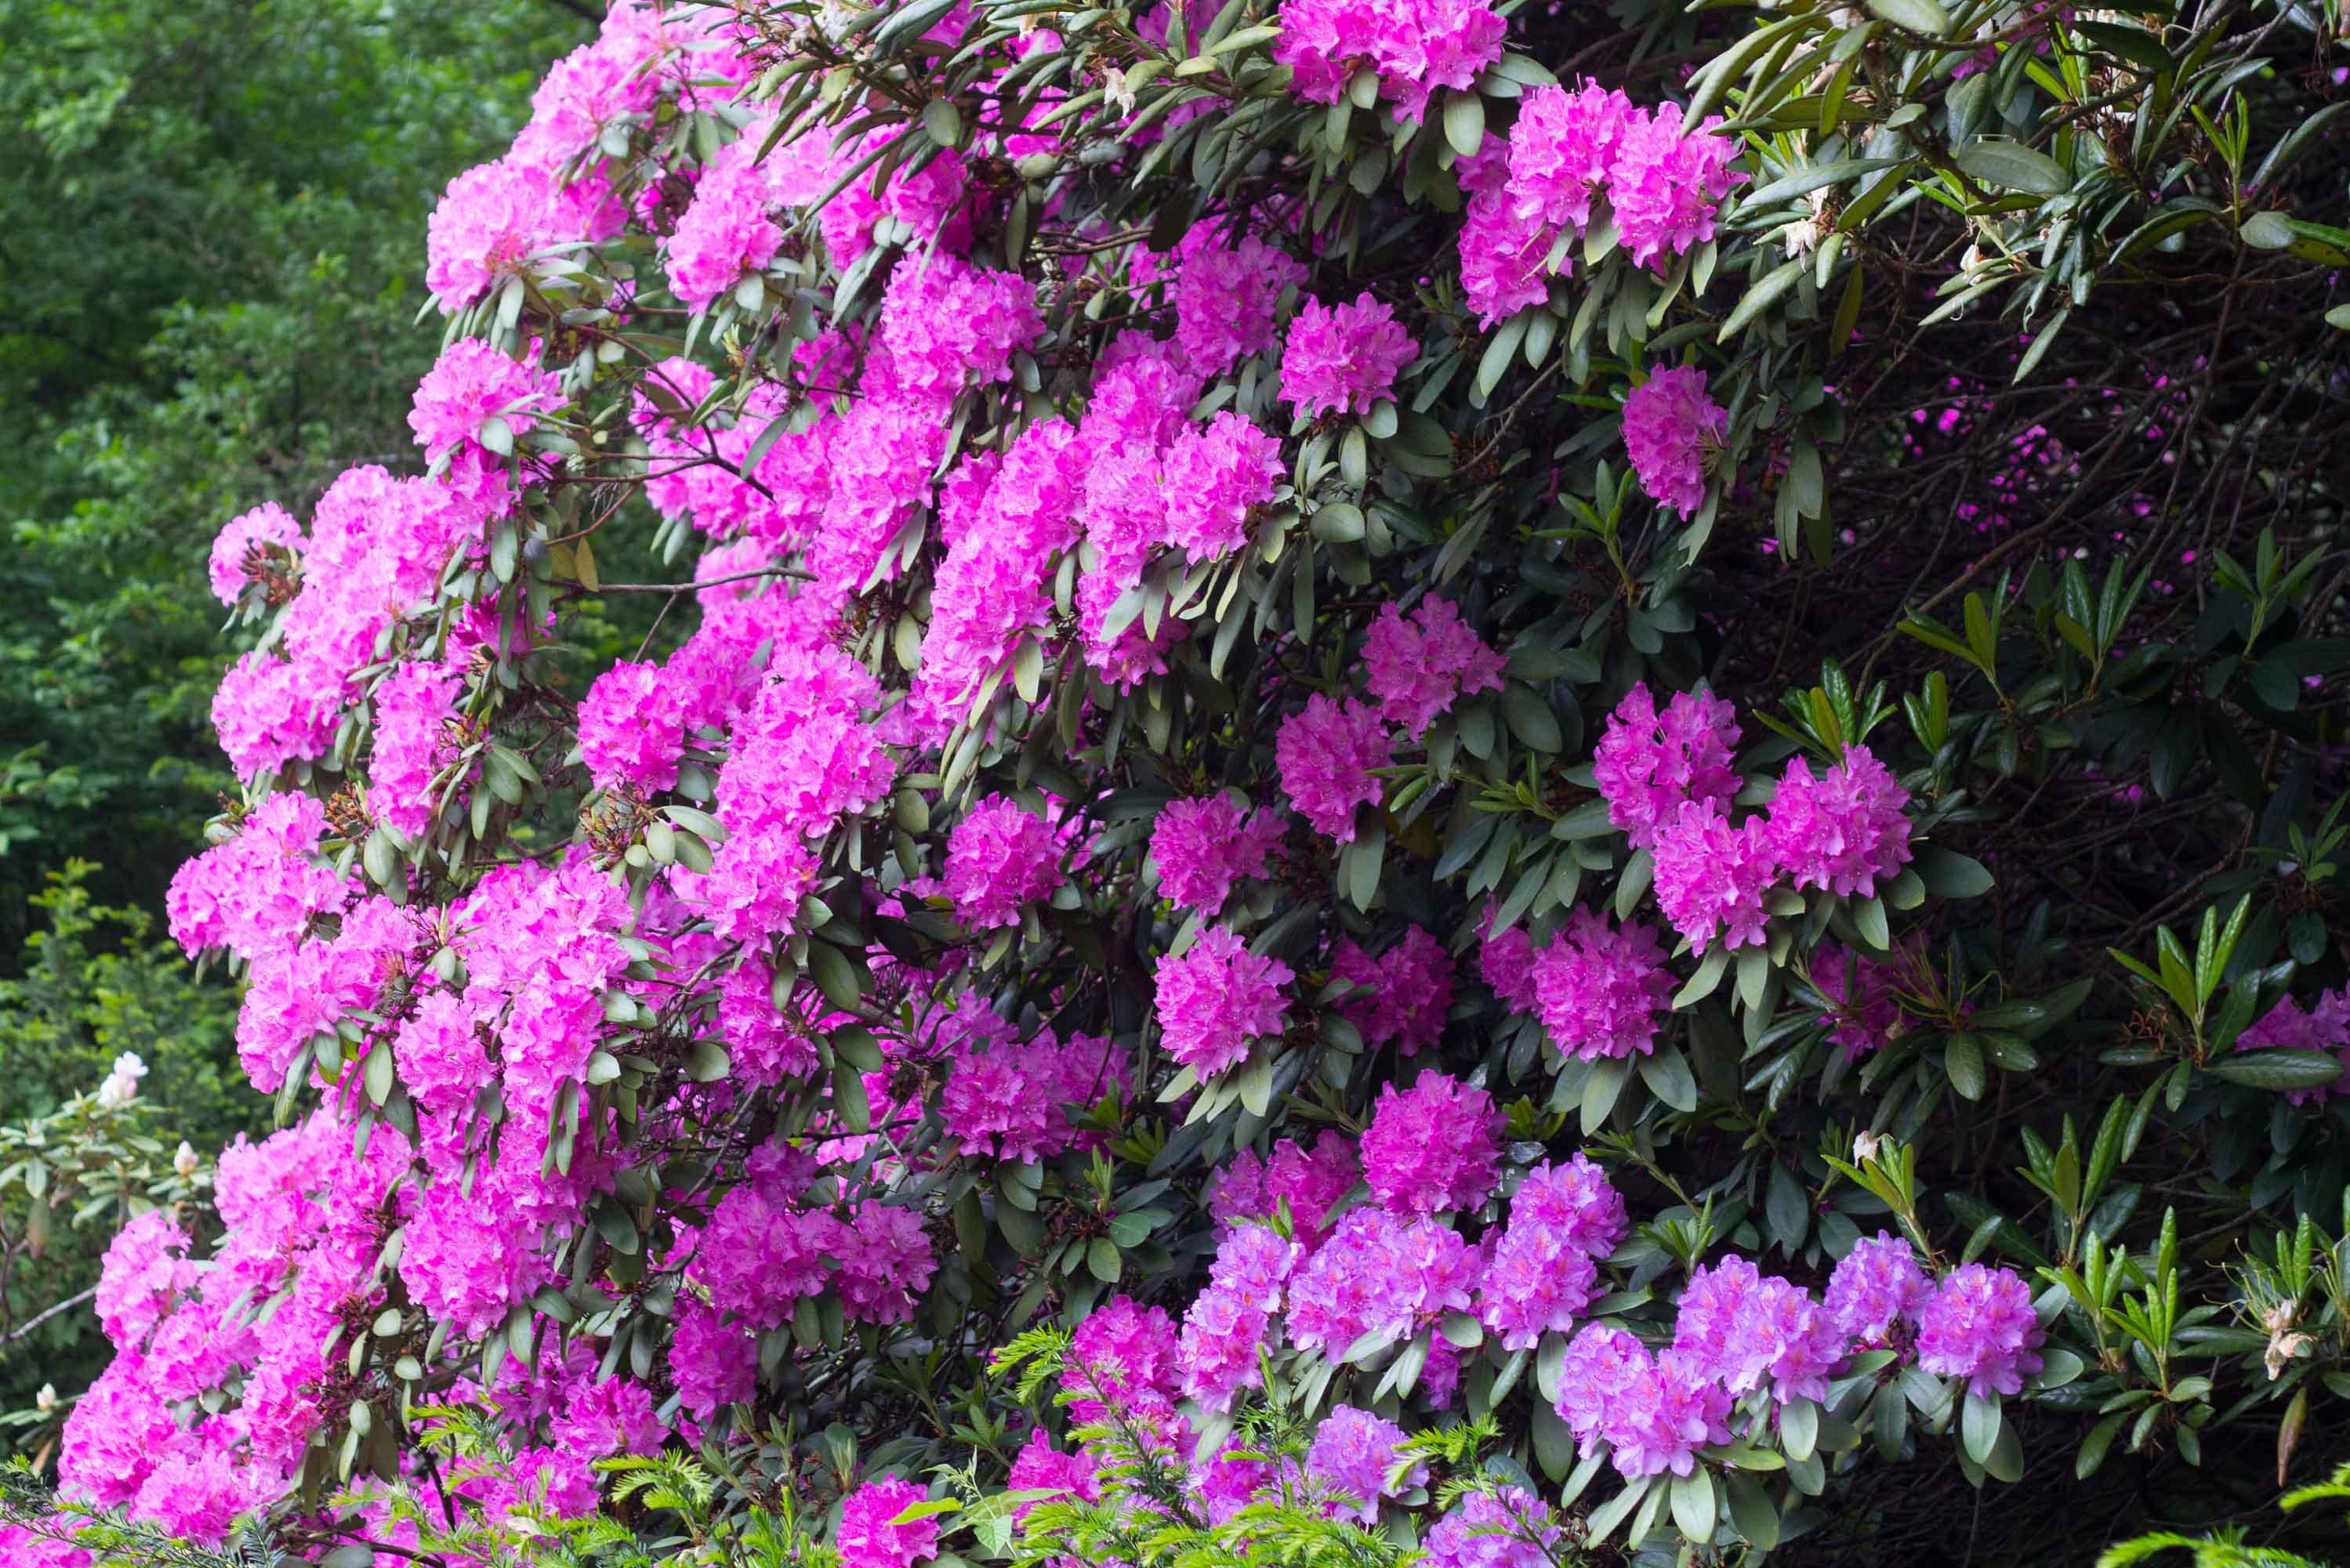 rododendrony-azalky-2013-arboretum-zv-10